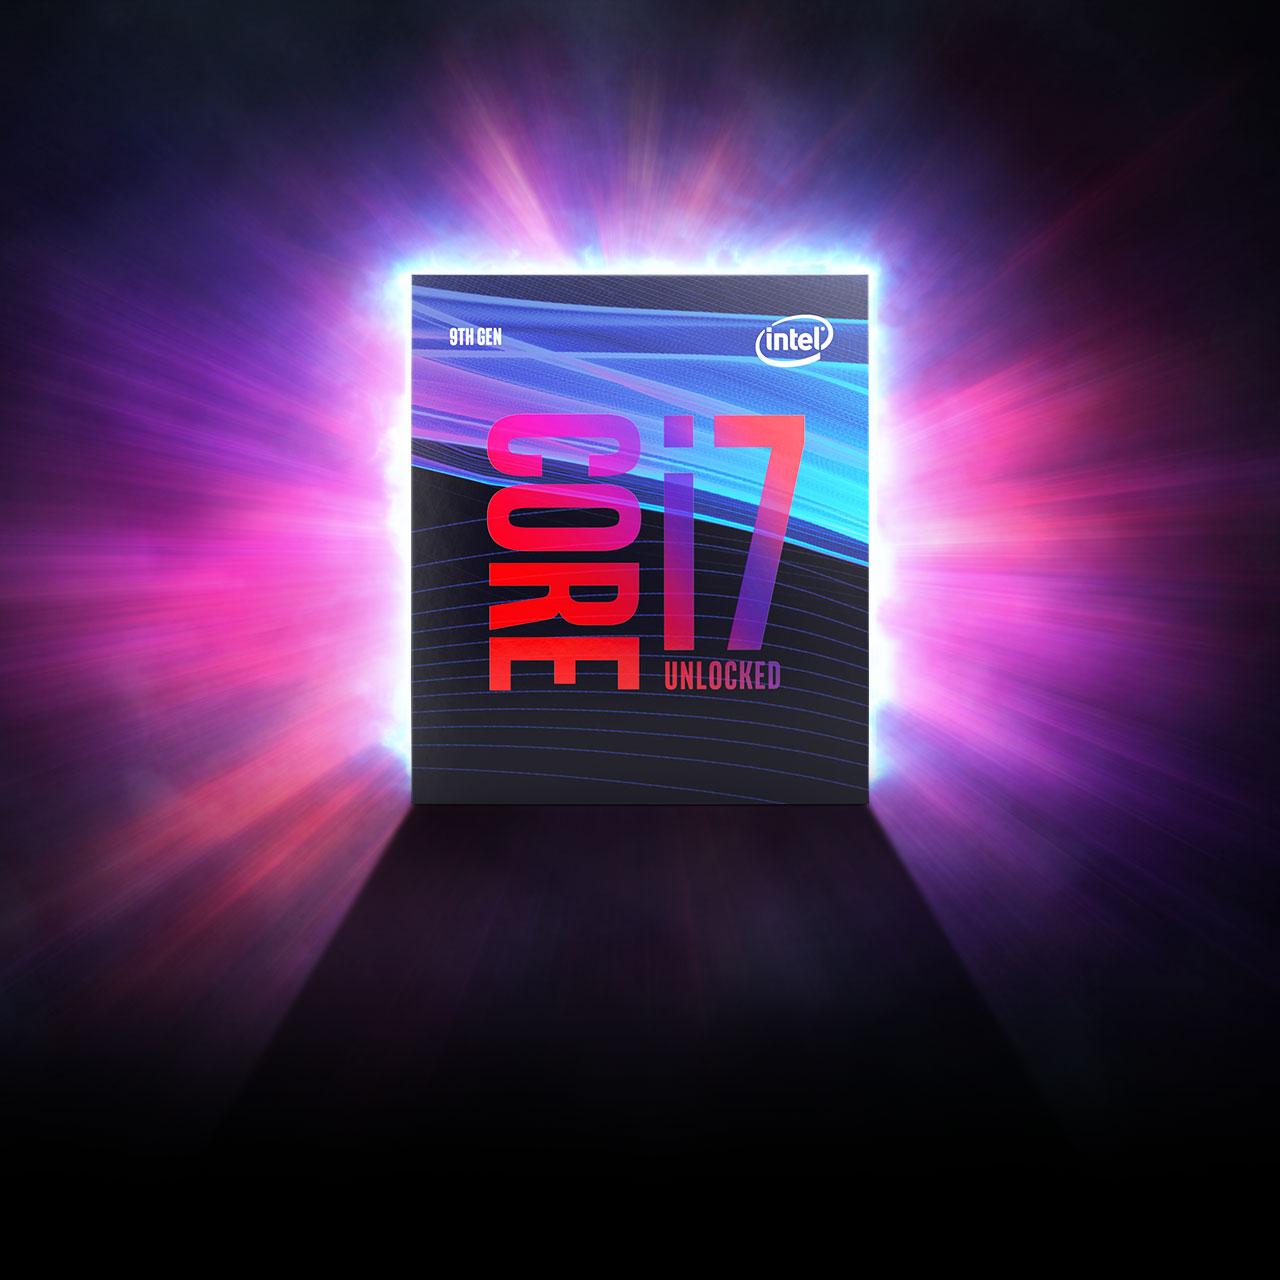 Procesador Intel Core I7-9700K 8Core 3.6-4.90Ghz 95W Socket